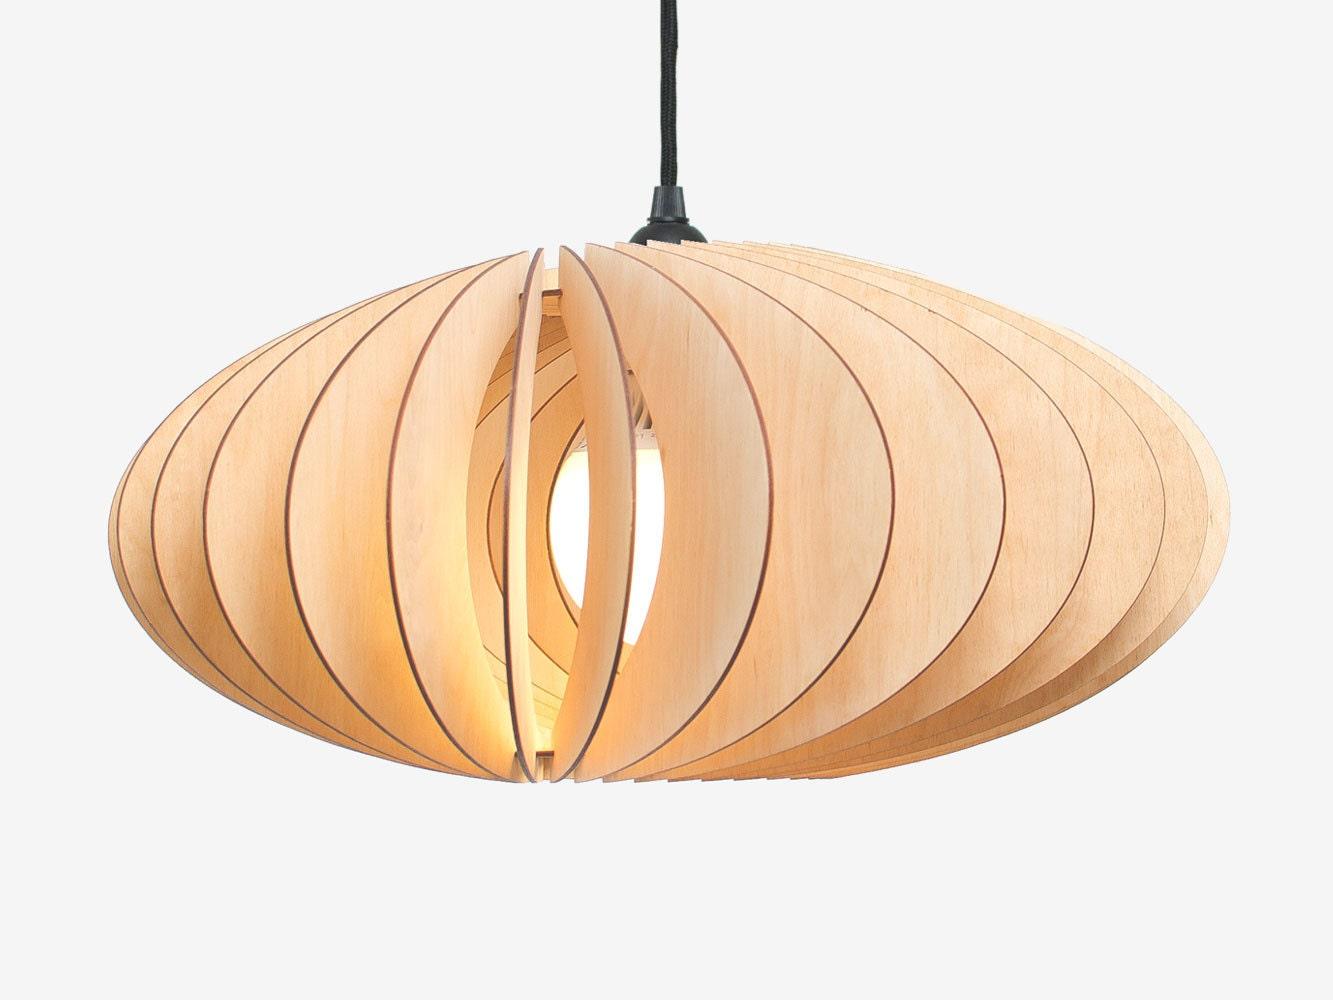 lampe pendante nefi de bois de suspensions de lampes. Black Bedroom Furniture Sets. Home Design Ideas